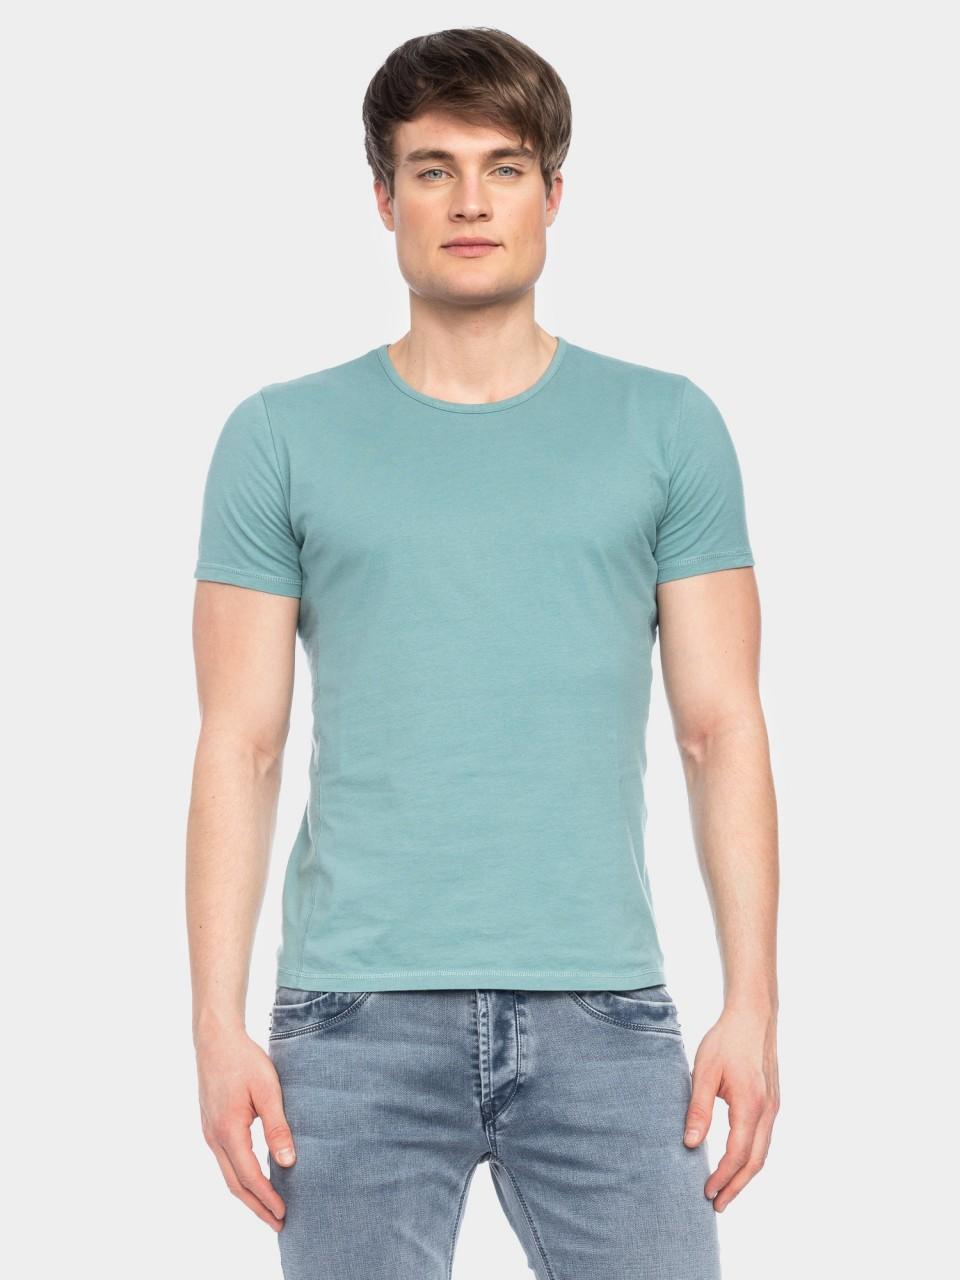 N T-Shirt Pluto OC ARCT